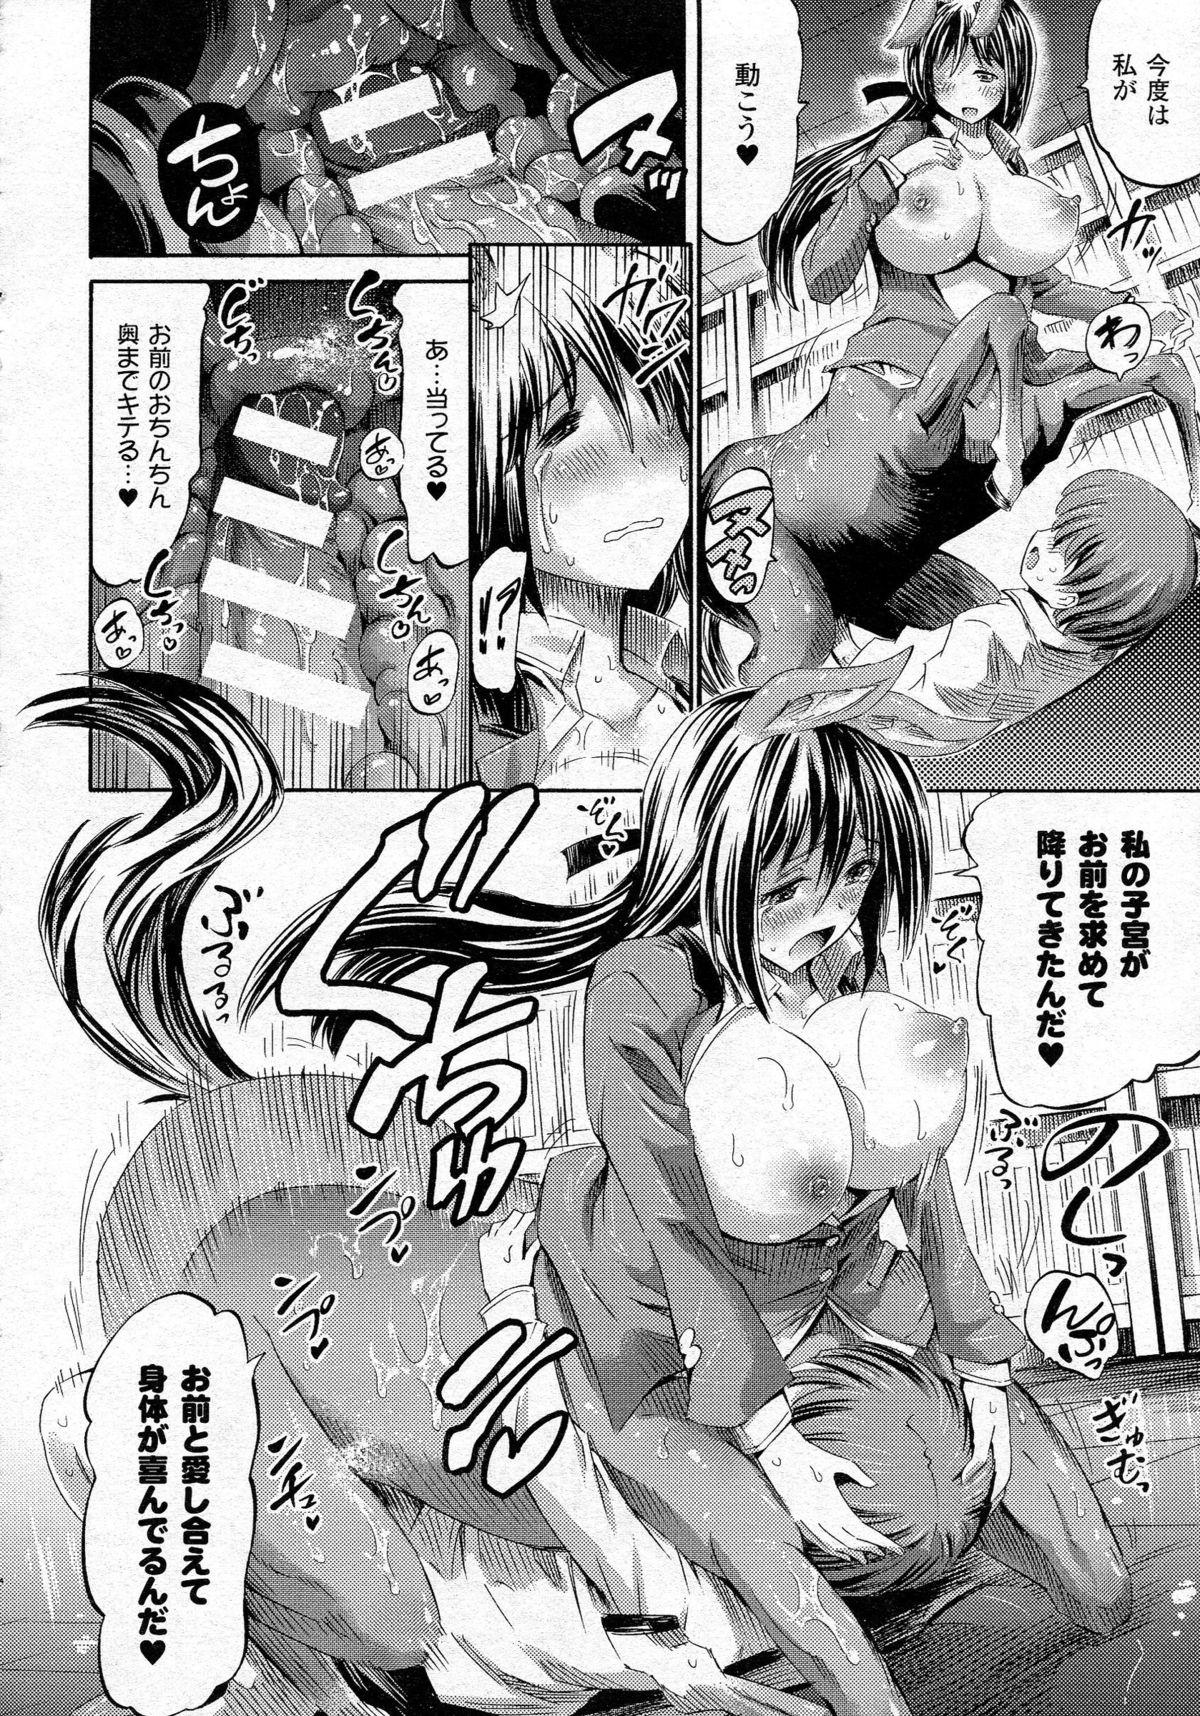 COMIC Unreal 2015-06 Vol. 55 + Hisasi Illust Shuu 204